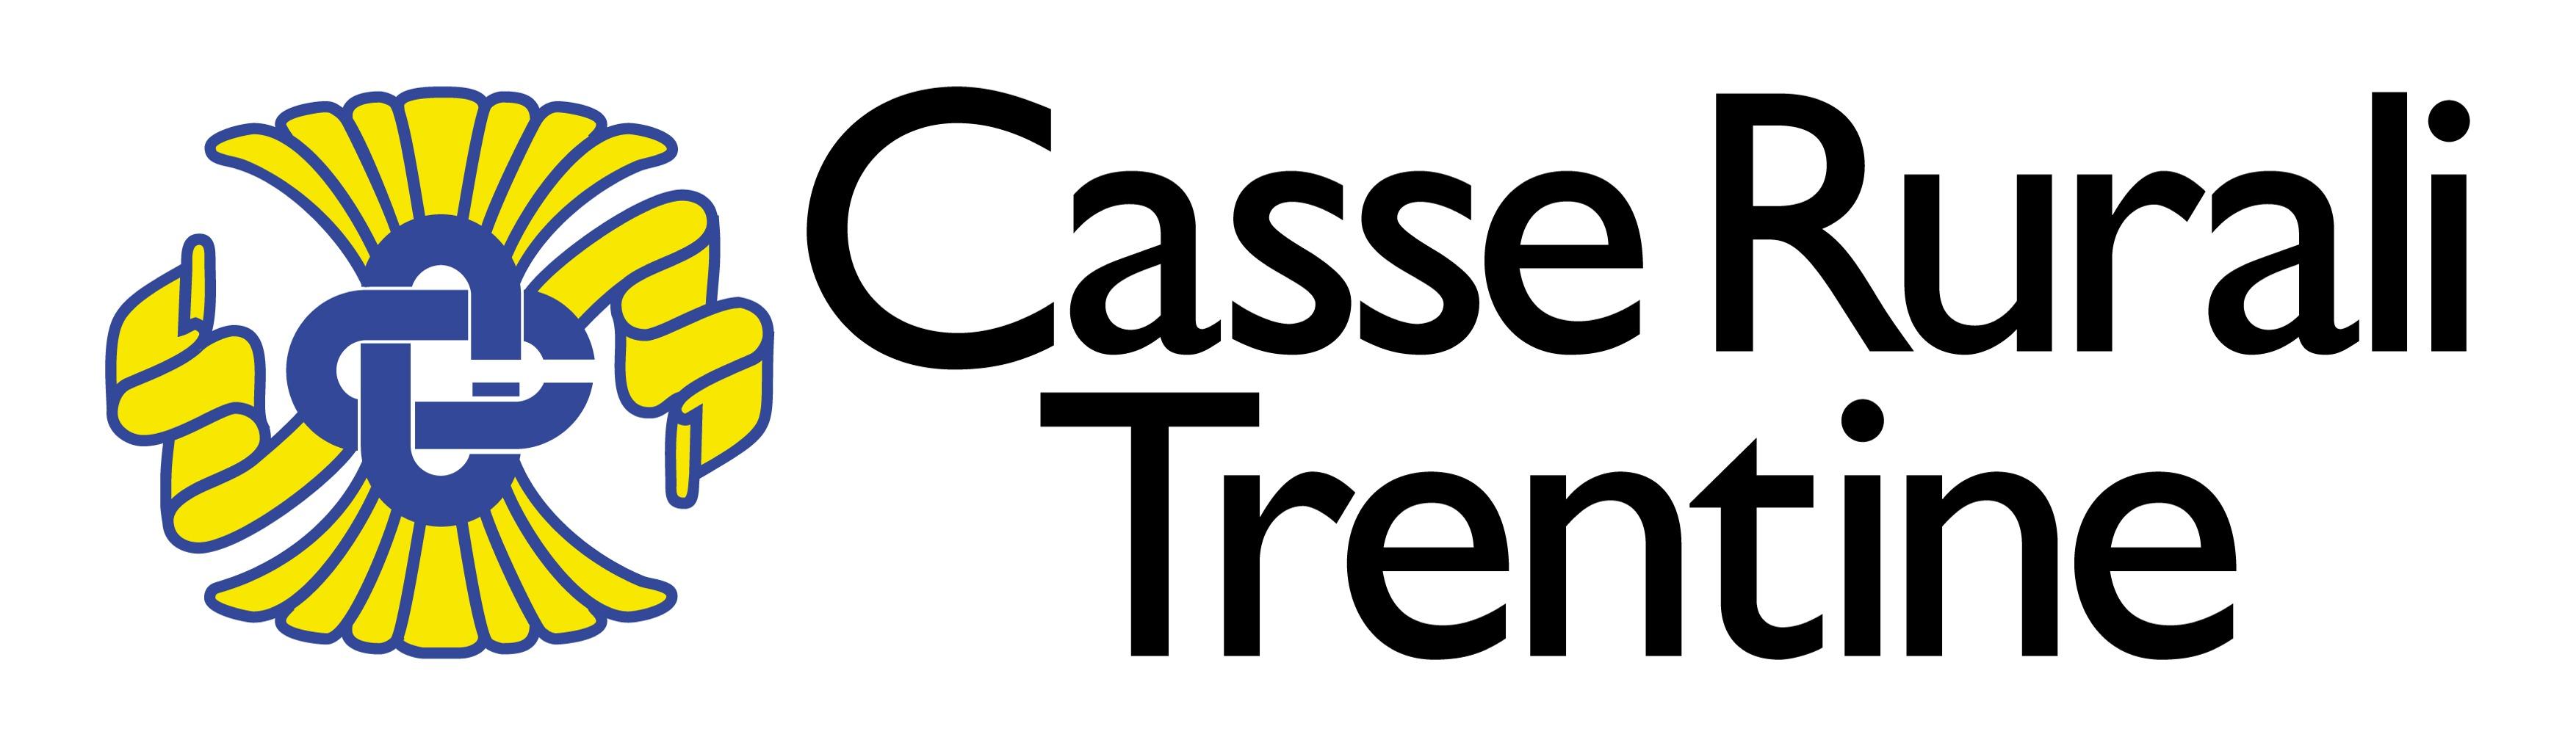 Casse Centrali